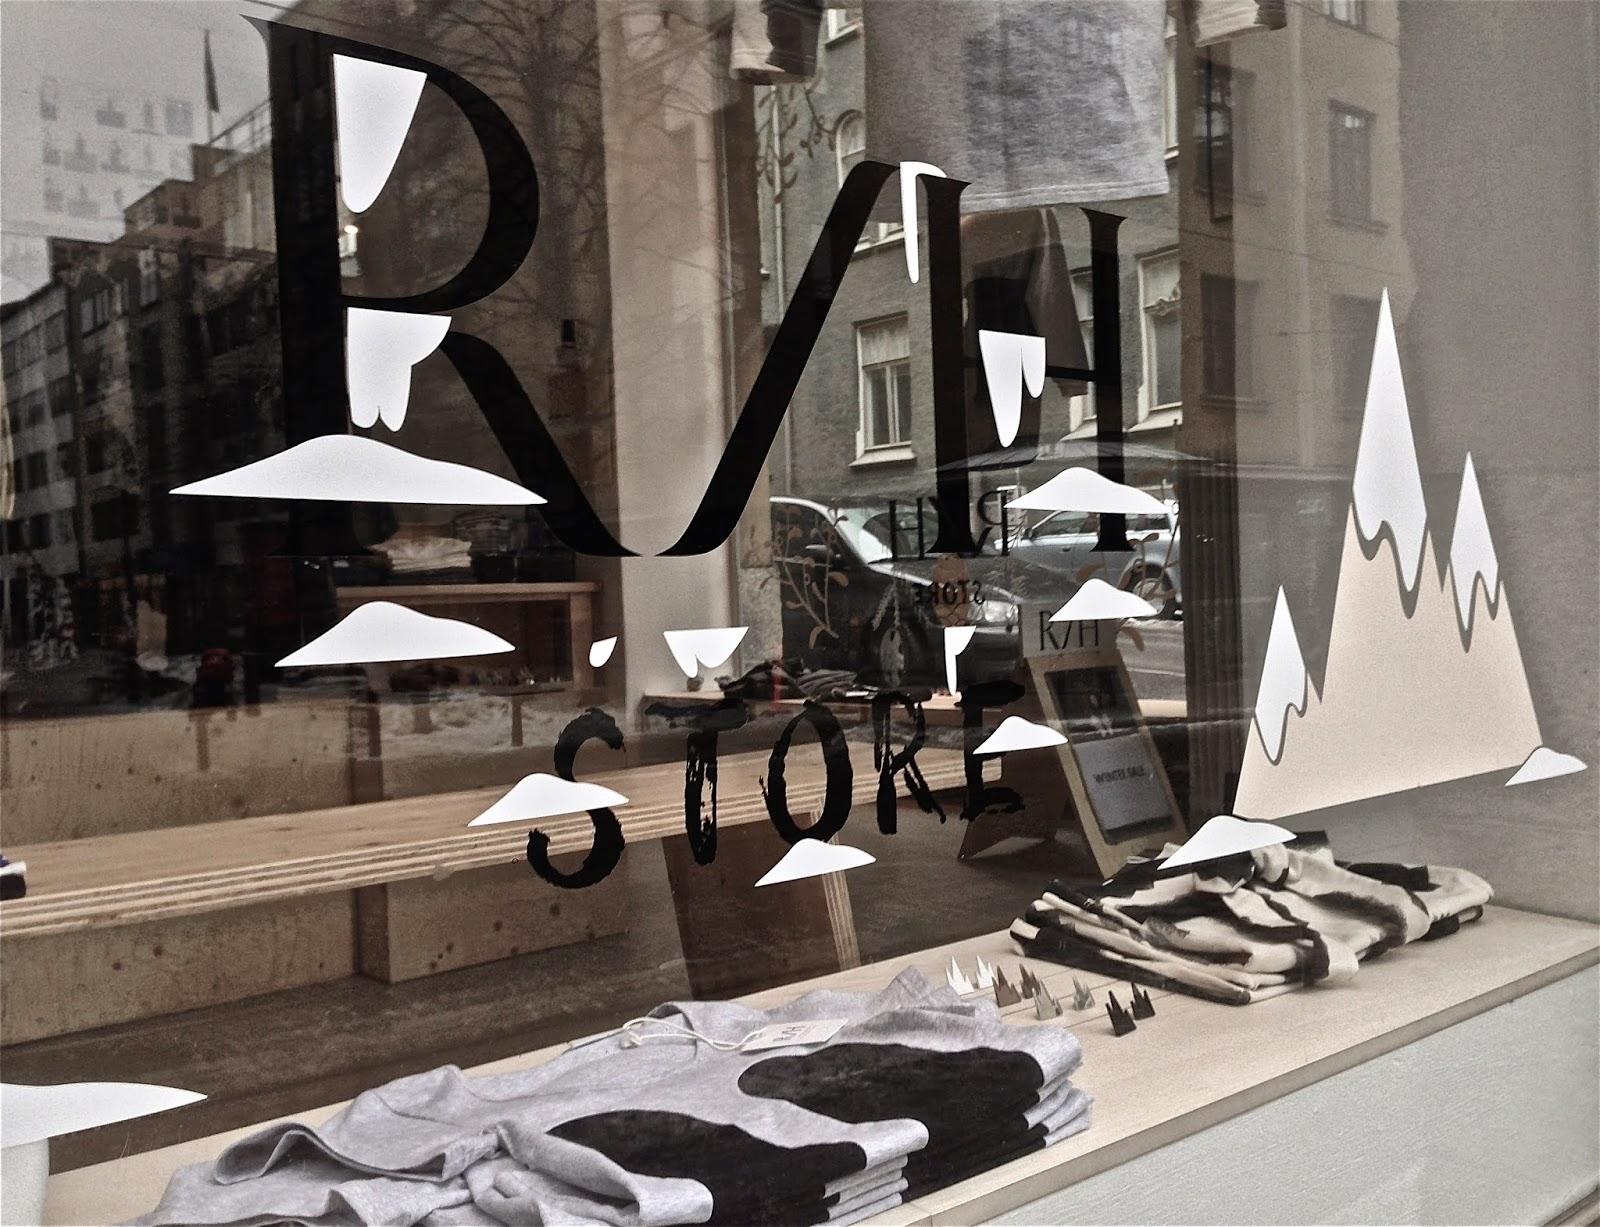 RH Store, Fredrikinkatu 18